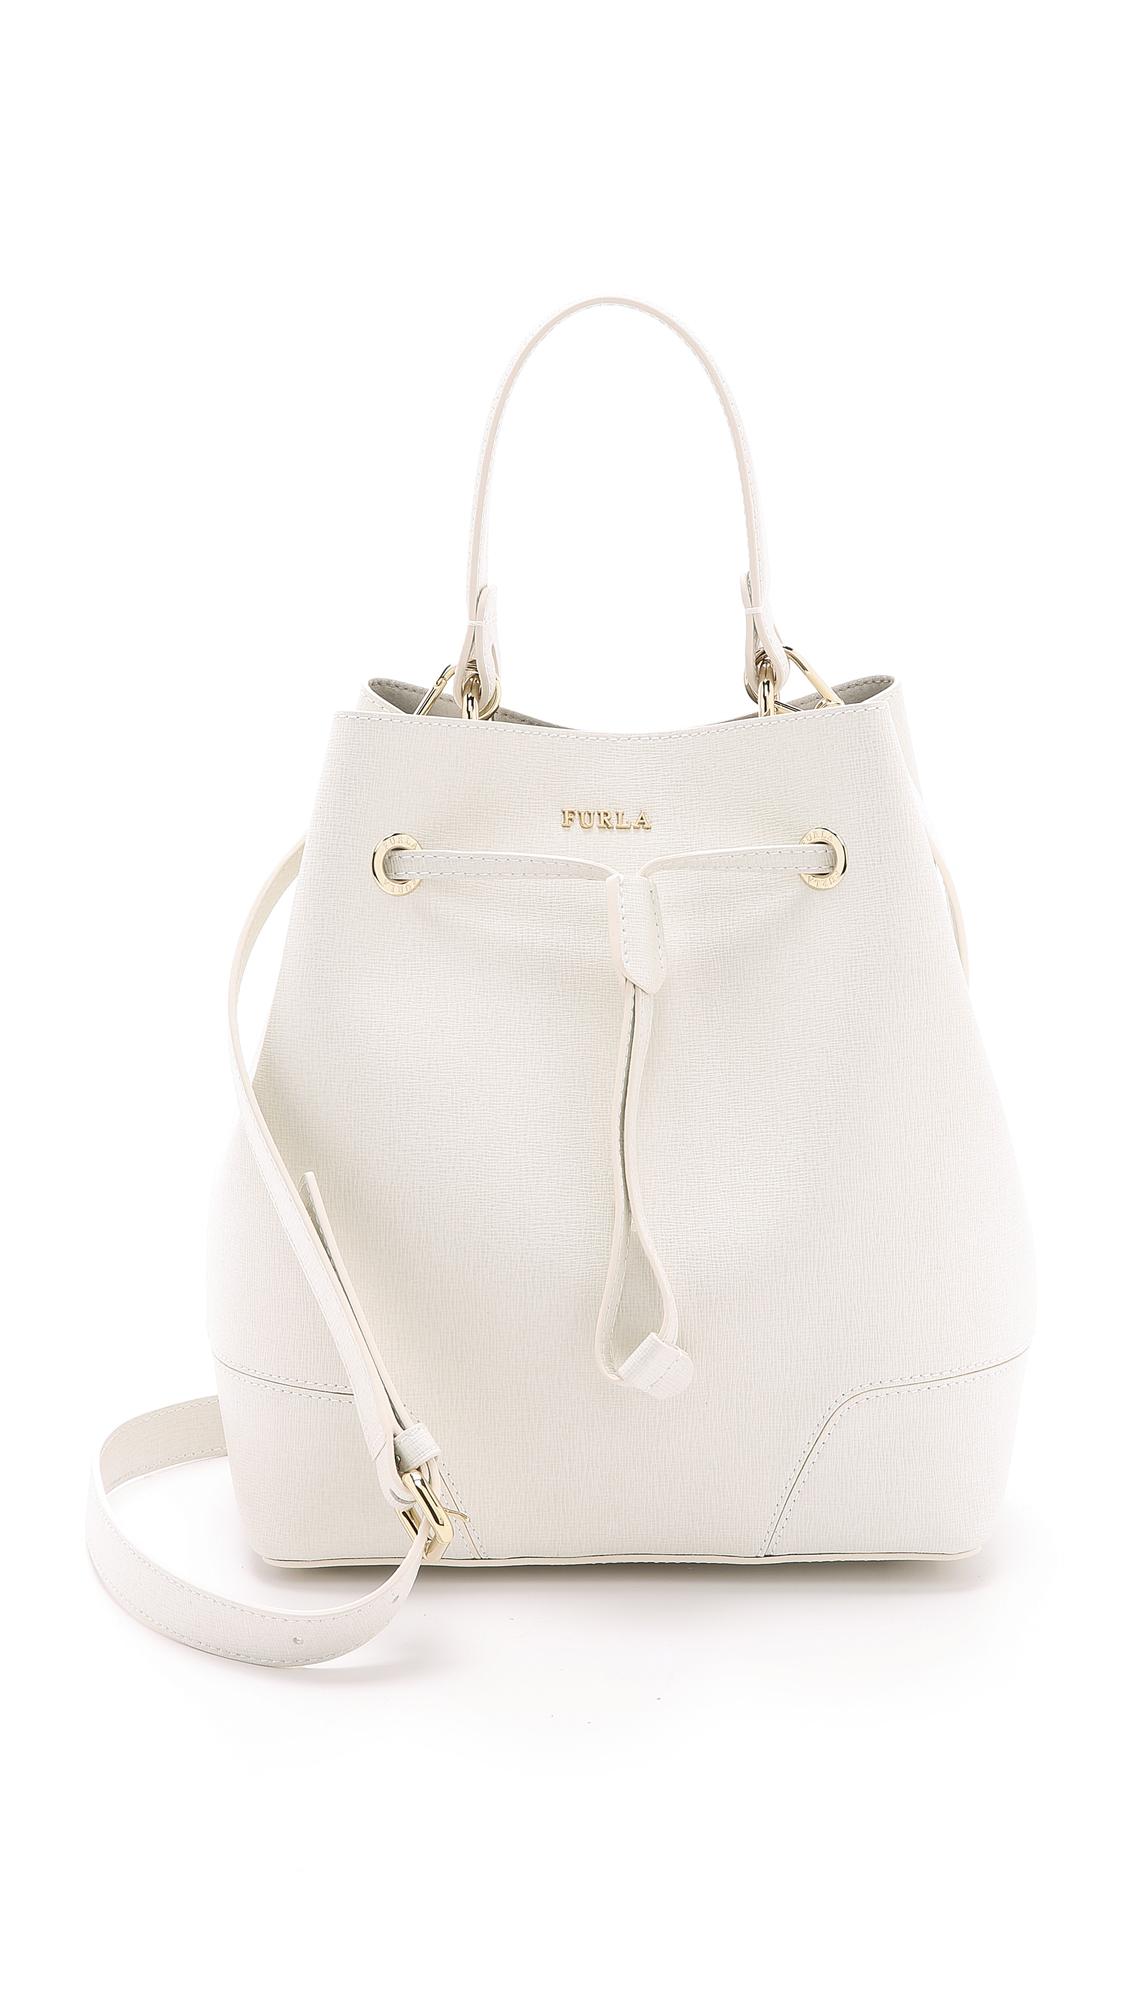 Furla Stacy Drawstring Bucket Bag White